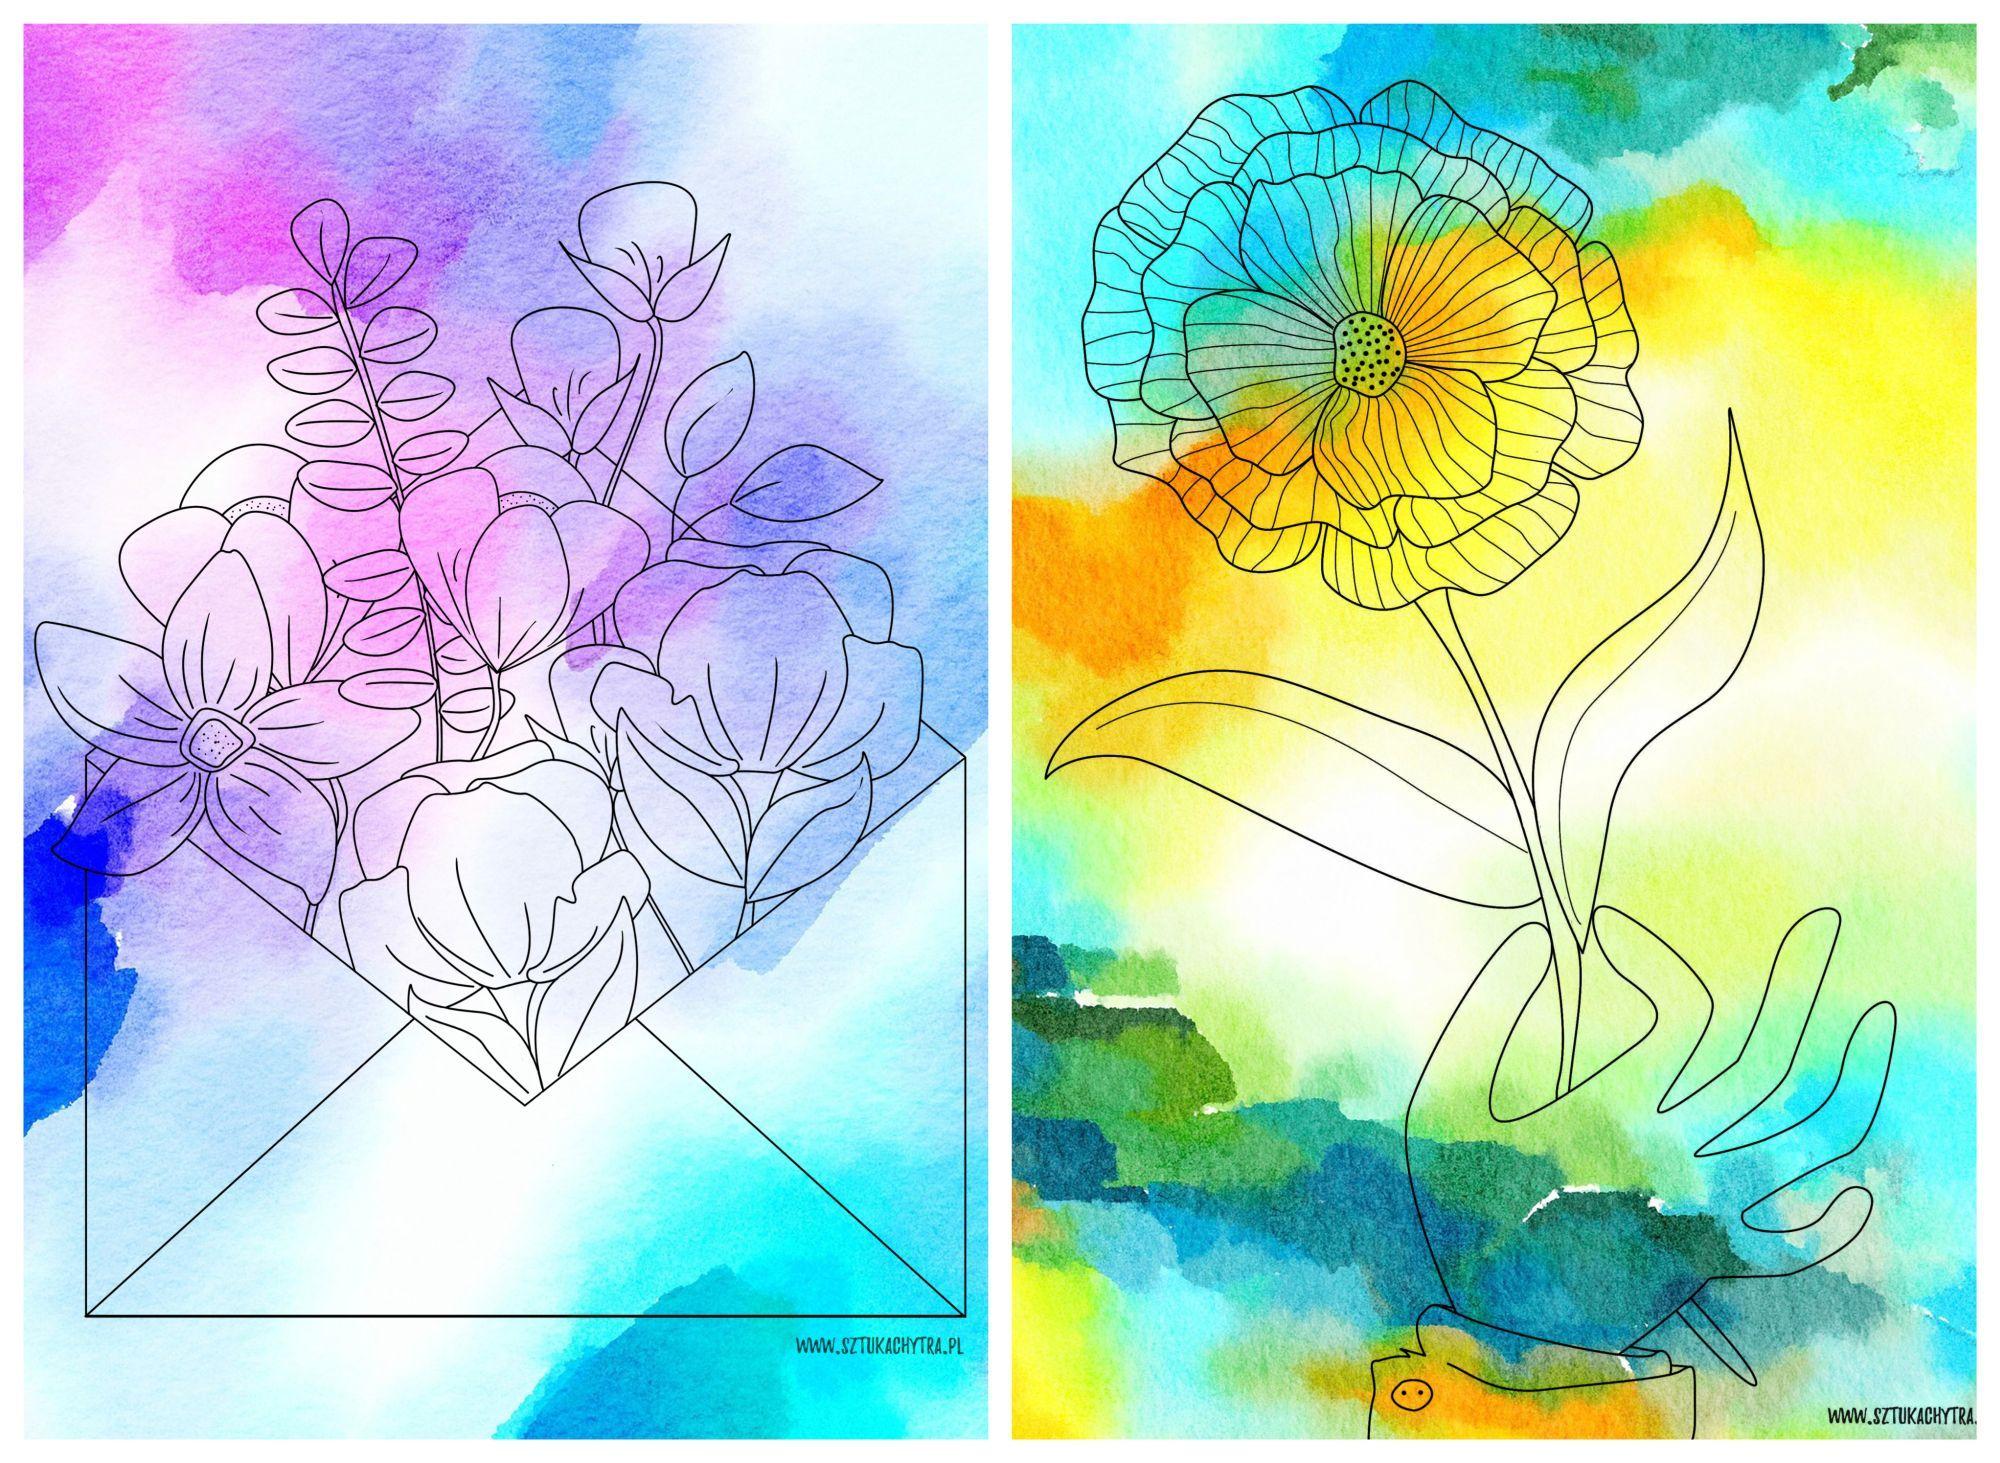 Kolorowanki Dzien Mamy Dzien Taty Chytra Sztuka In 2020 Abstract Artwork Abstract Art